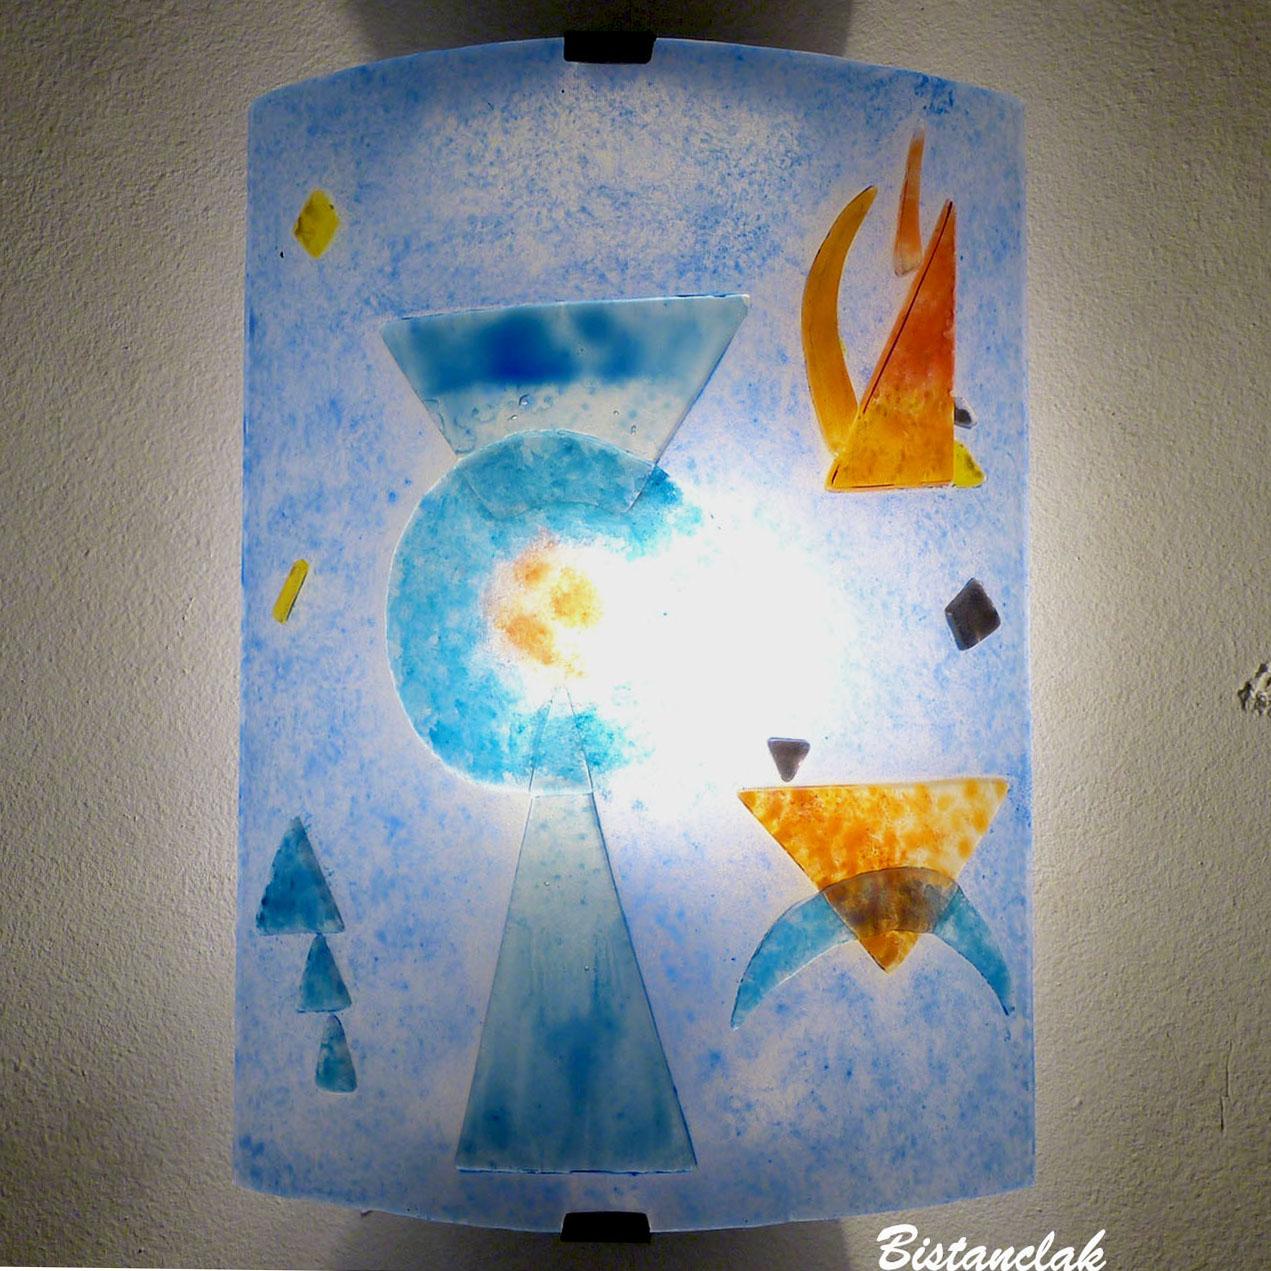 Luminaire applique murale design geometrique bleu et orange inspiration kandisnky 8